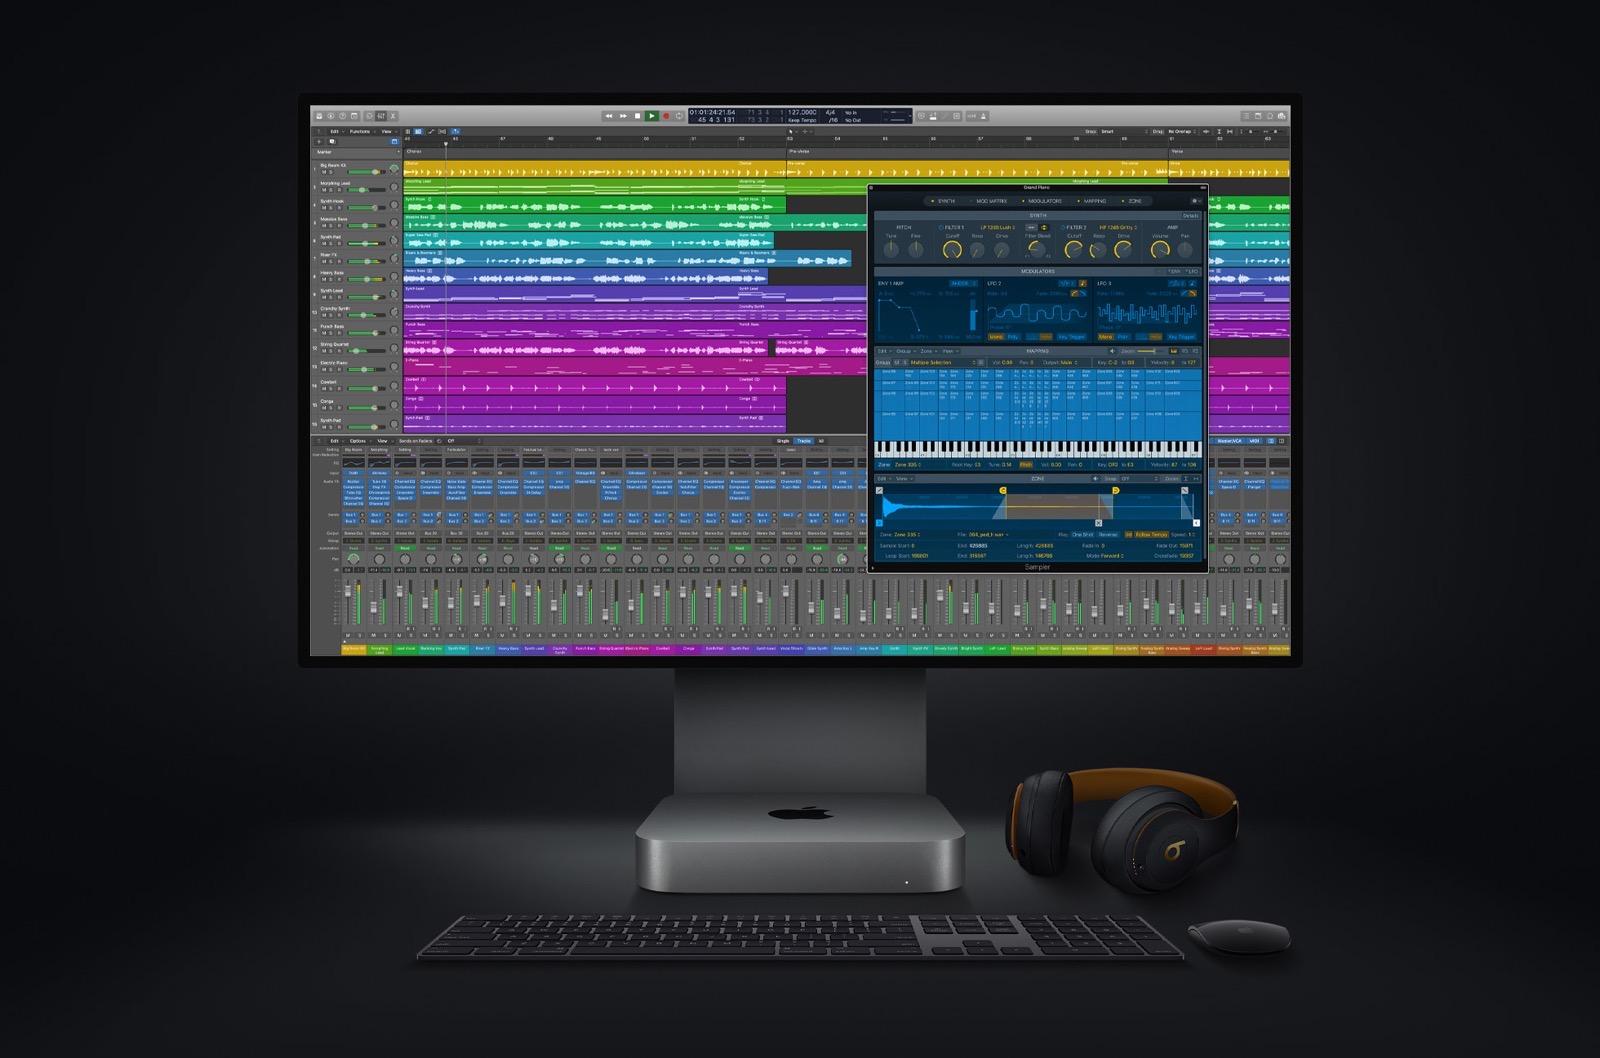 Apple new mac mini logicpro screen 11102020